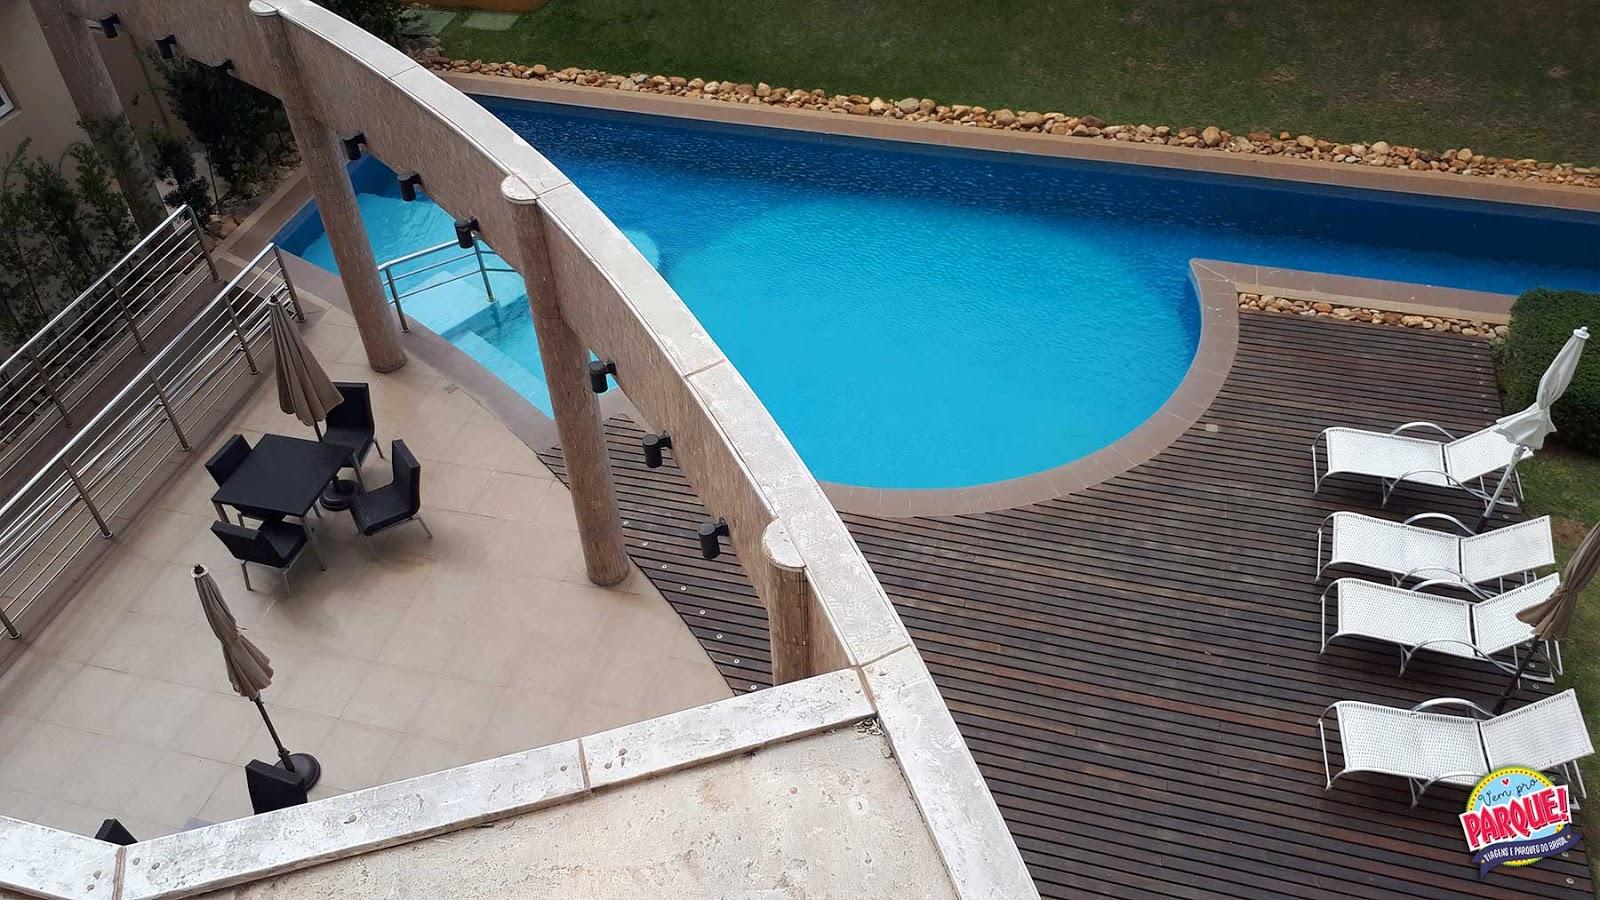 Hotel Intercity Vinhedo Orlando Brasileira